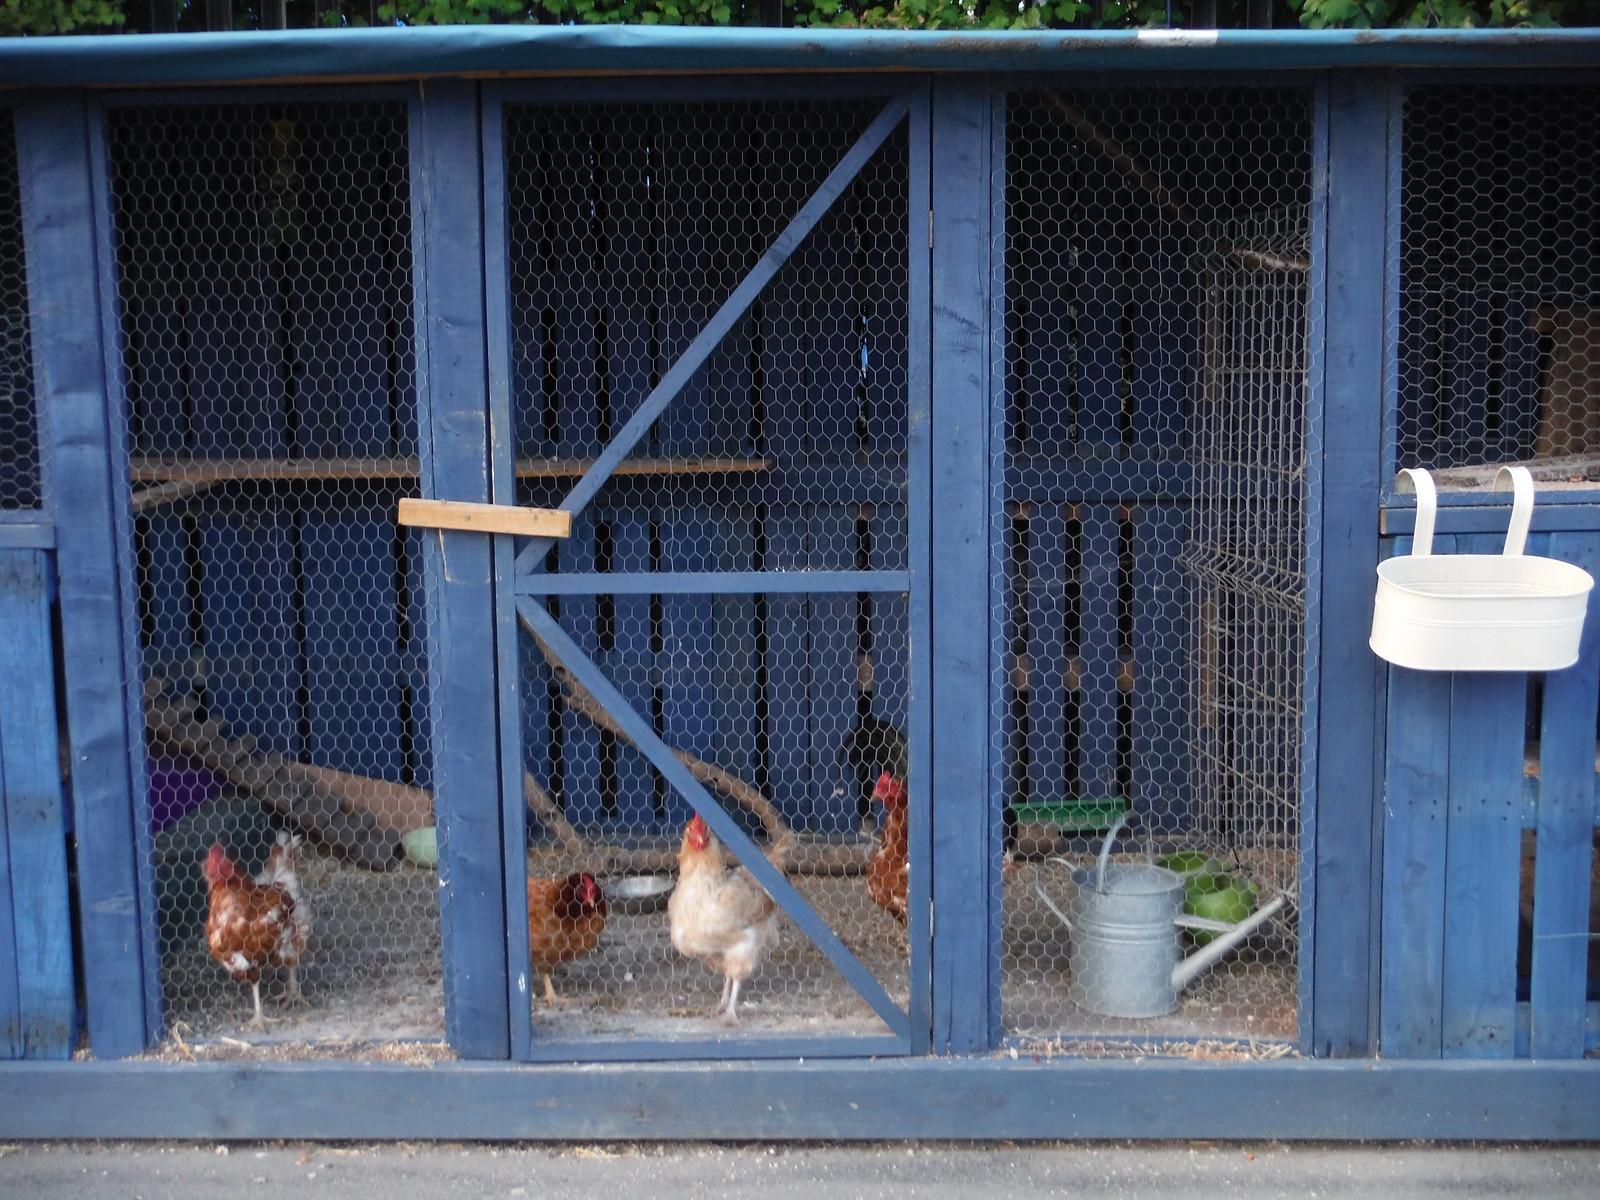 Chicken coop at Cody Dock SWC Short Walk 21 - The Line Modern Art Walk (Stratford to North Greenwich)